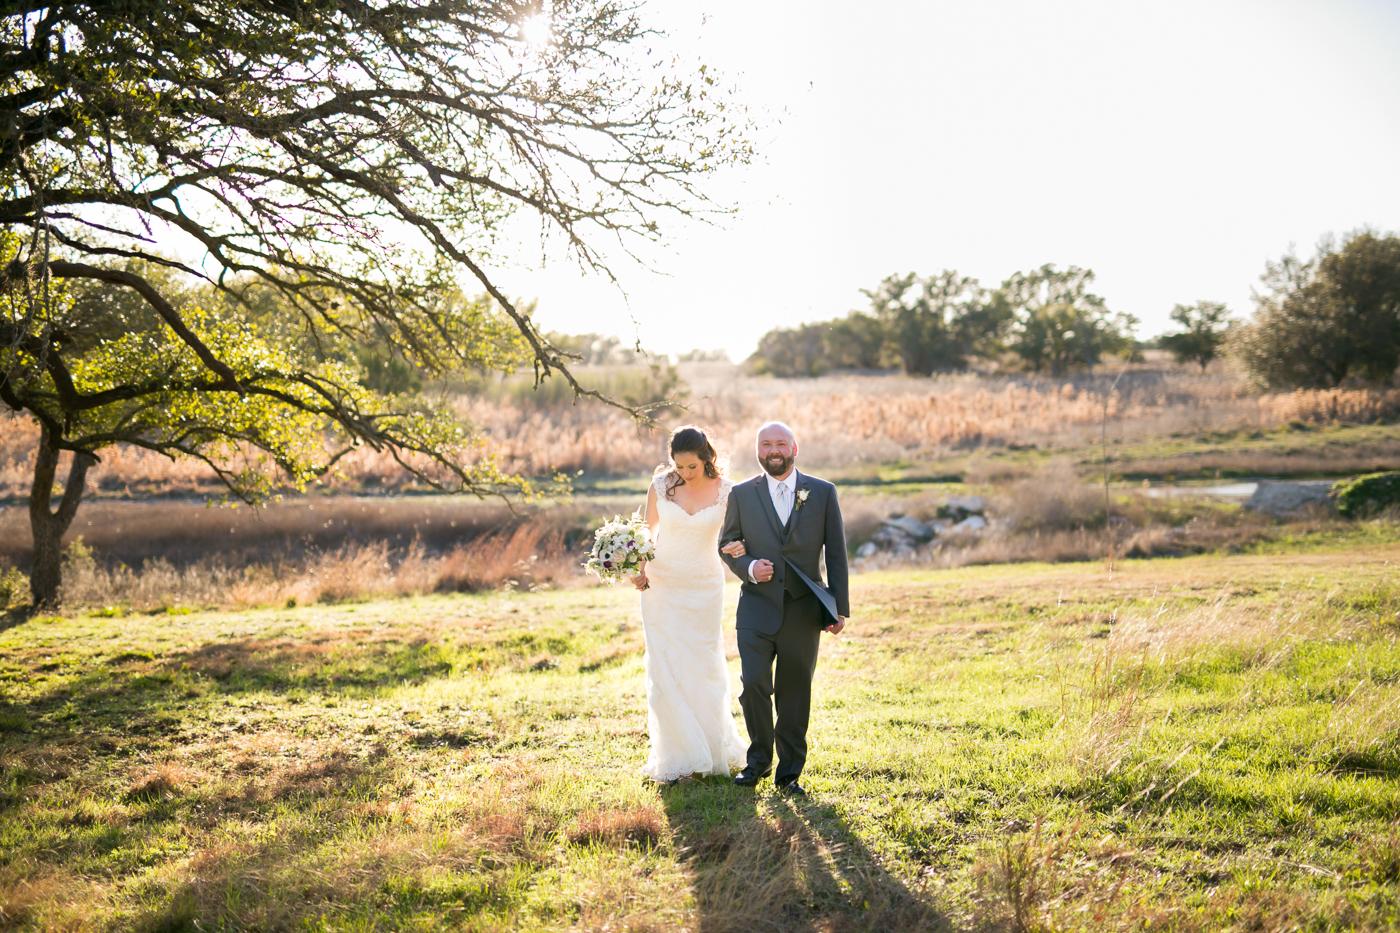 Austin-wedding-photo-and-video-026.jpg